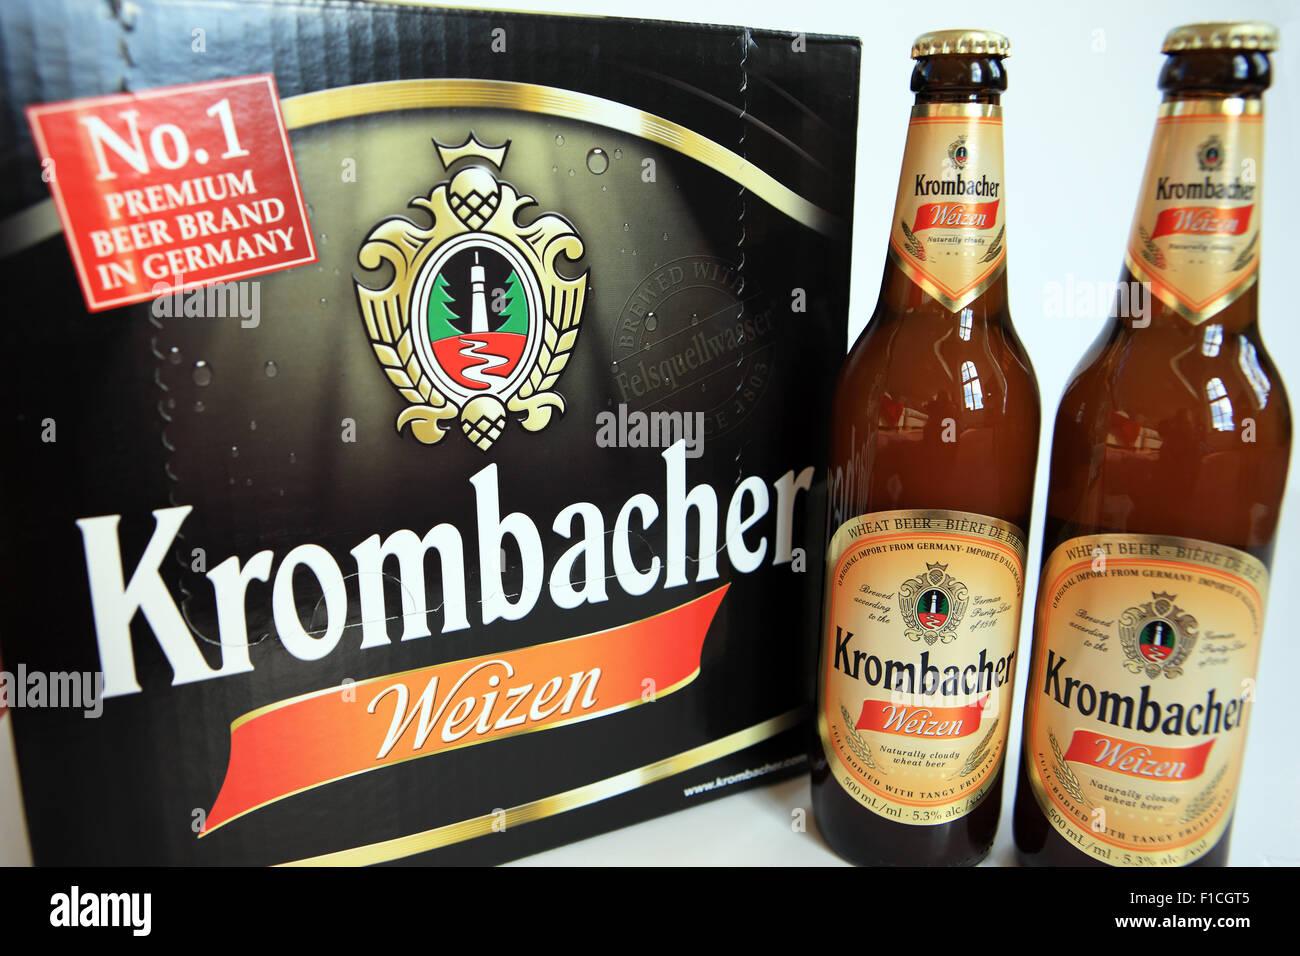 Botellas de Krombacher Weizen, la marca de cerveza premium número 1 en Alemania Imagen De Stock